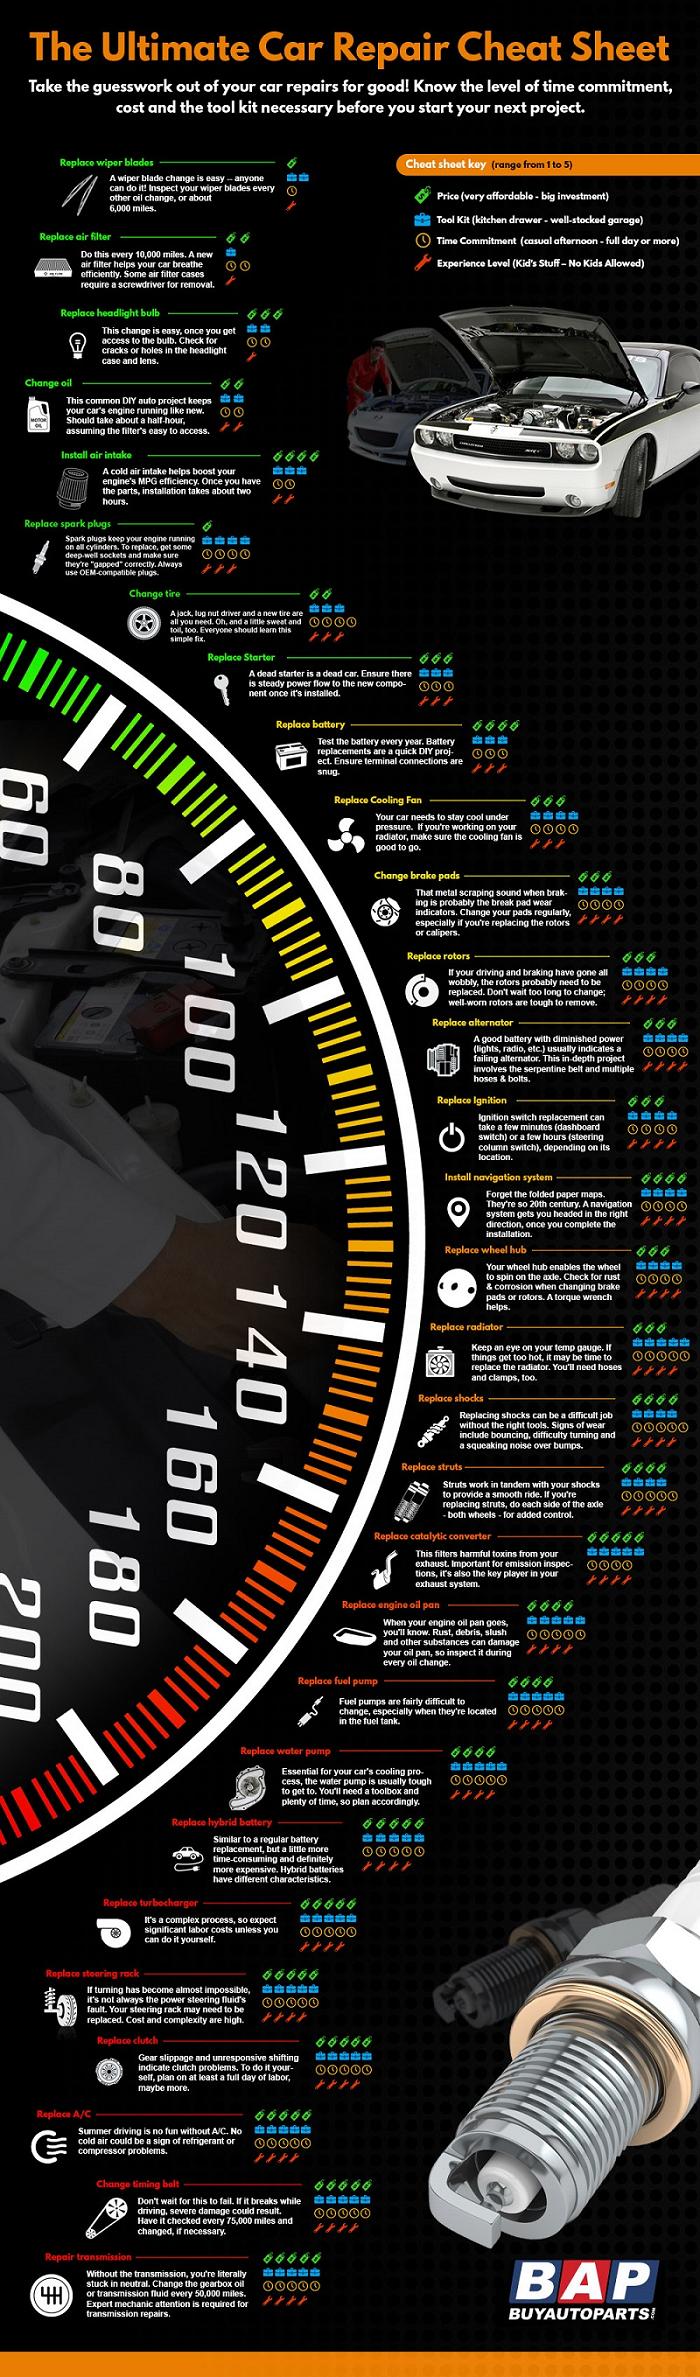 Infographic the ultimate car repair cheat sheet car repair infographic the ultimate car repair cheat sheet solutioingenieria Gallery